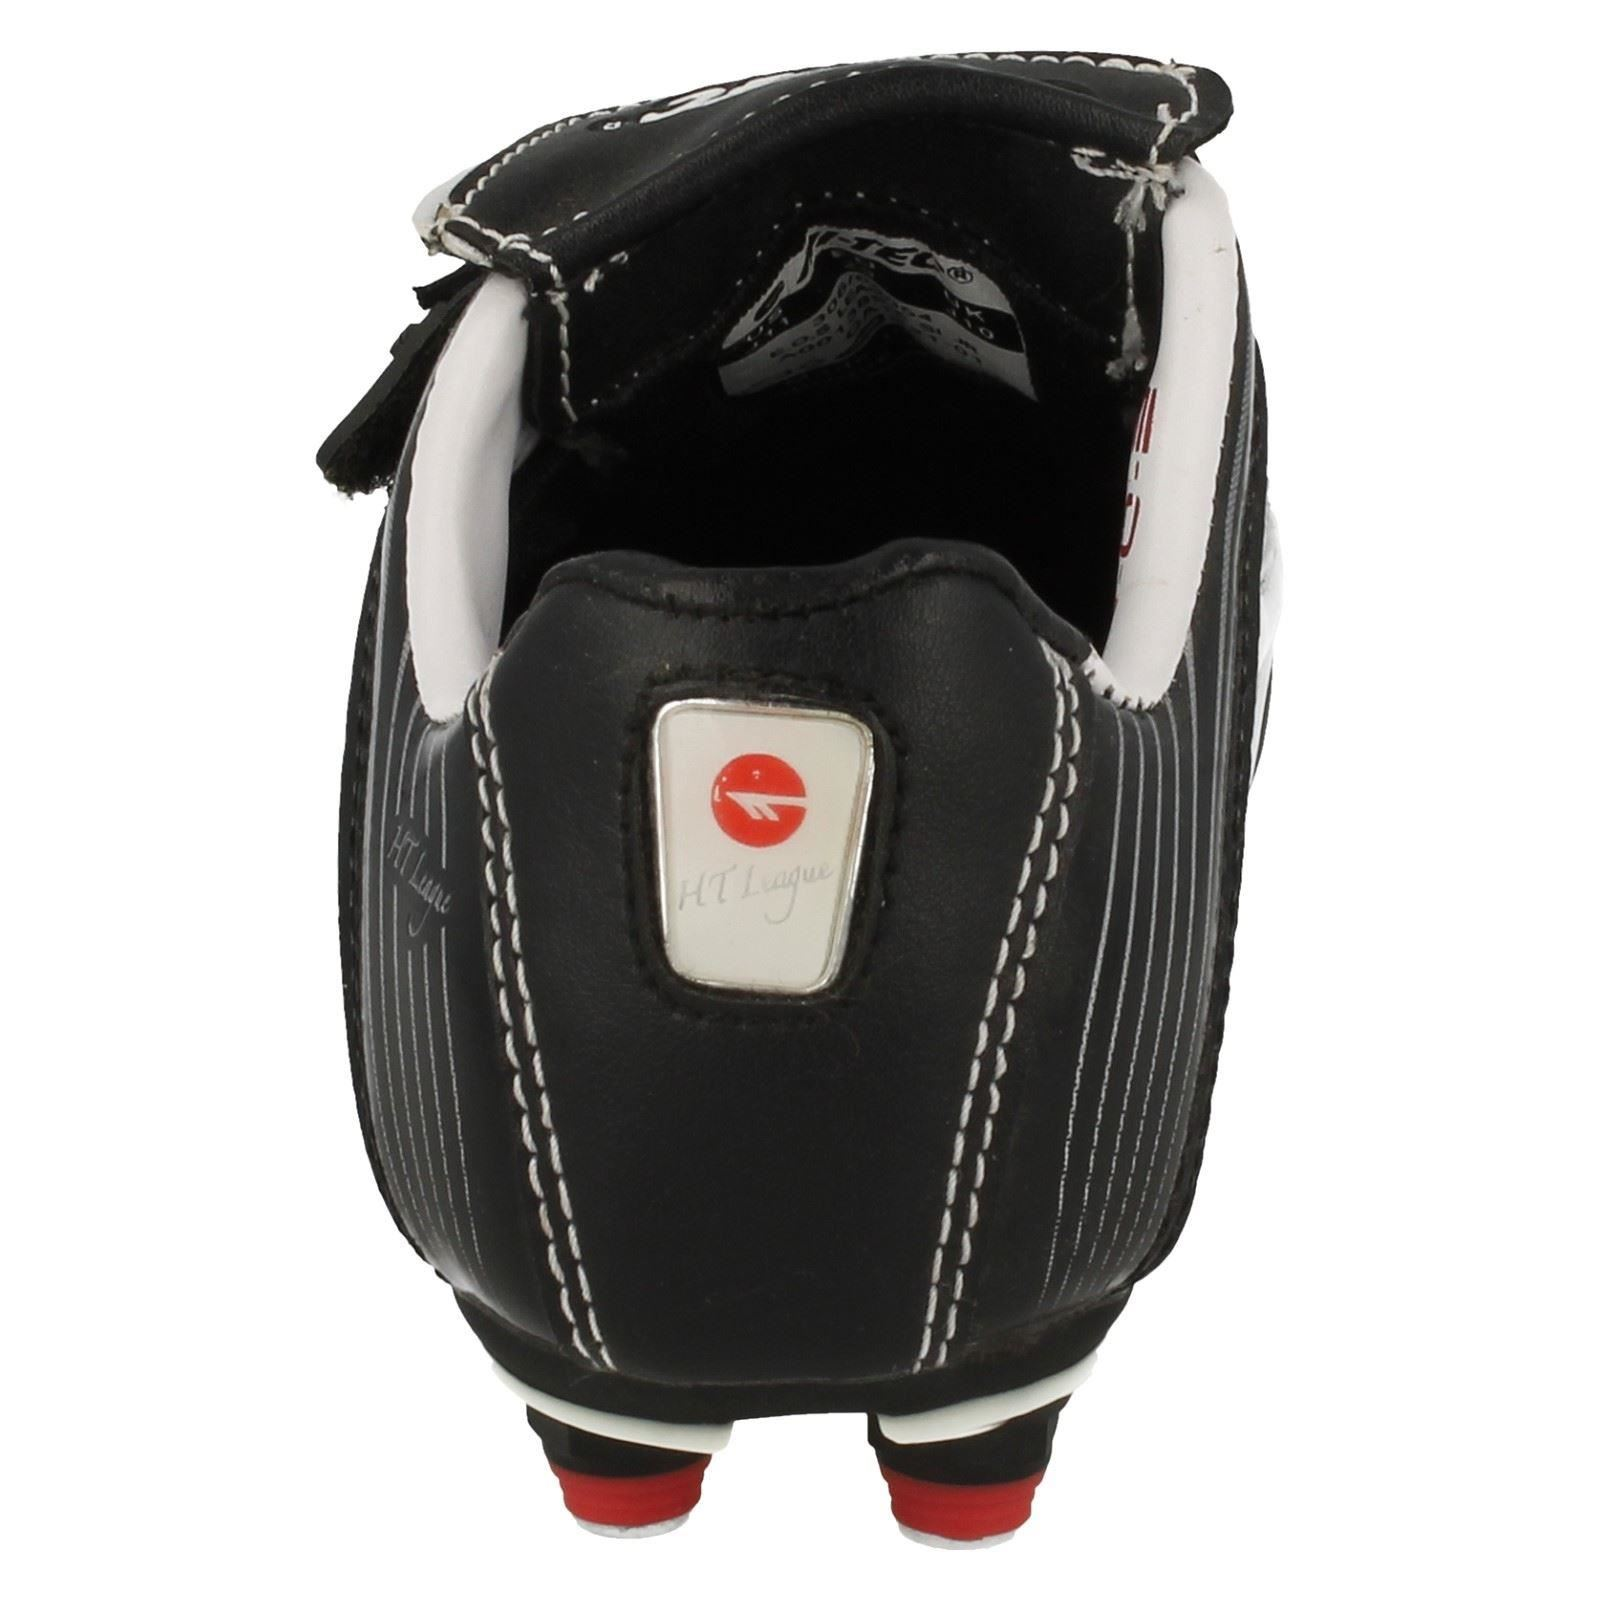 Boys Hi Tec Removable Studs Football Boots /'League Pro/'